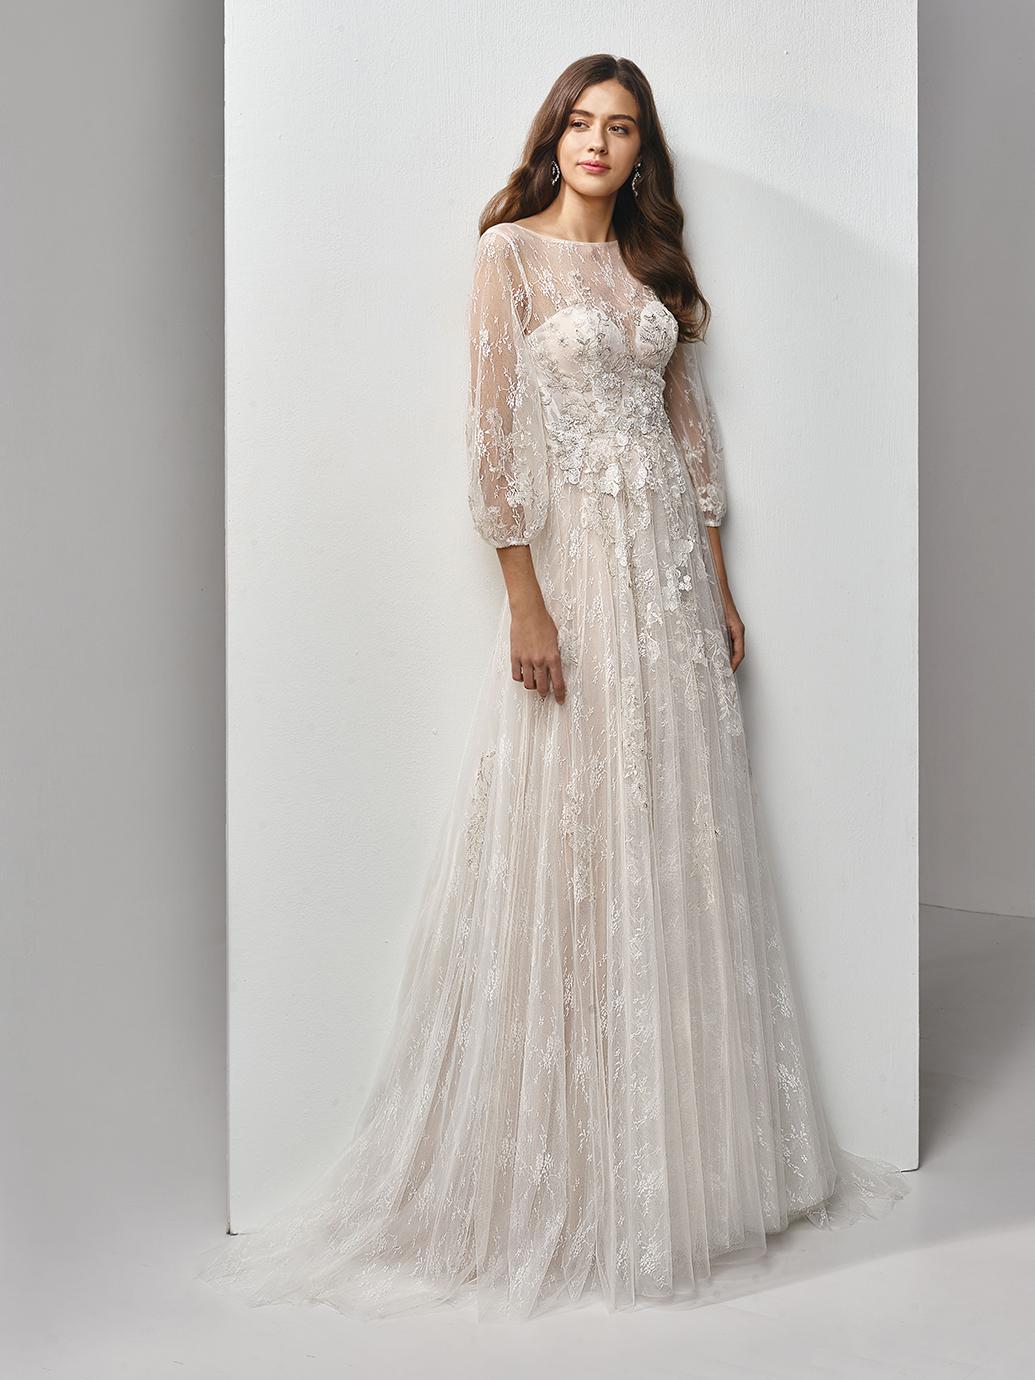 Enzoani Beautiful Wedding Dress AL0678, Long Sleeve wedding dress, Aline wedding dress, low back wedding dress, bohemian wedding dressBT19-18